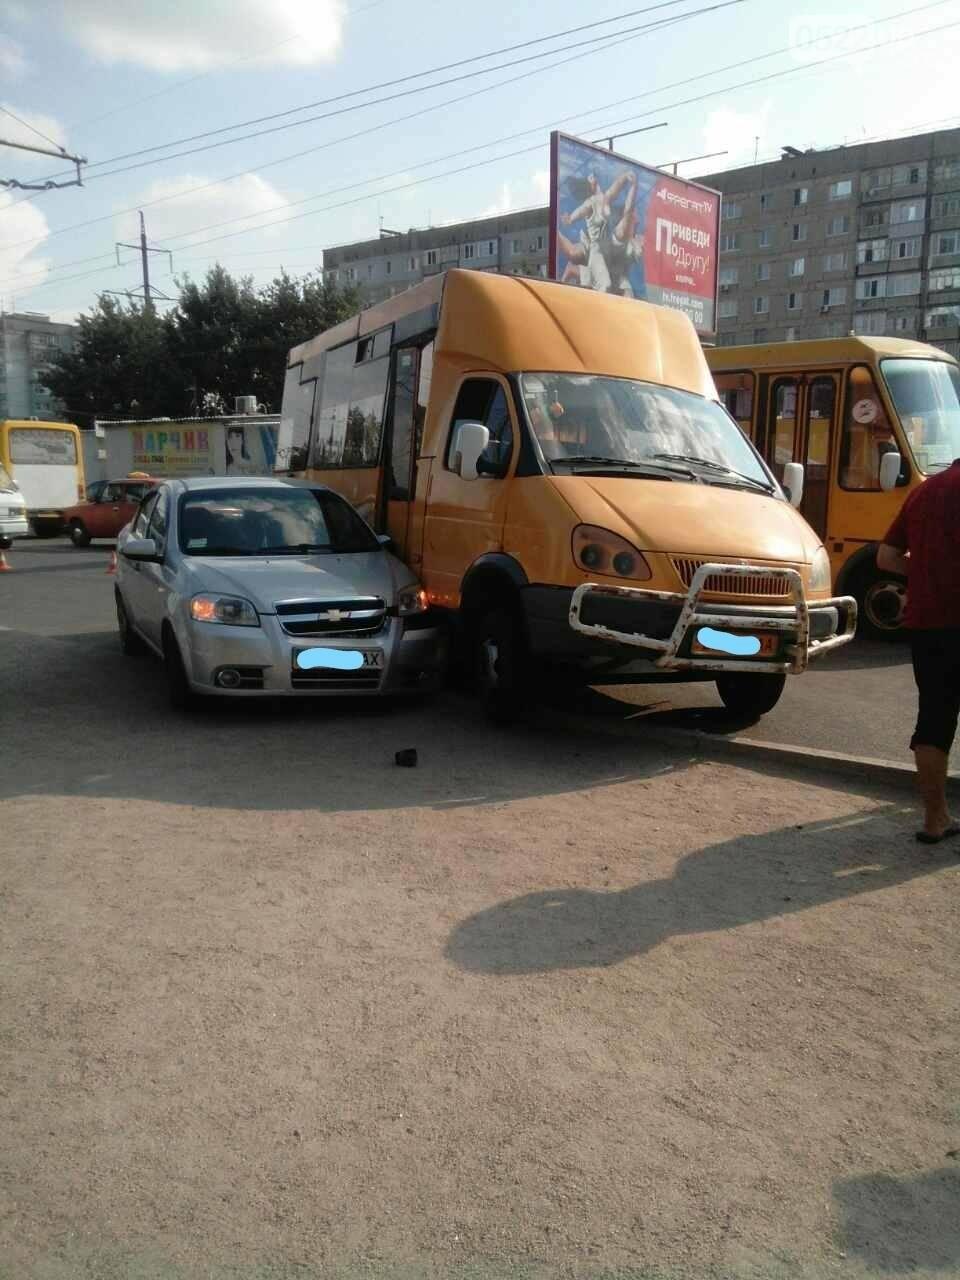 На Попова маршрутка столкнулась с легковым автомобилем. ФОТО, фото-2